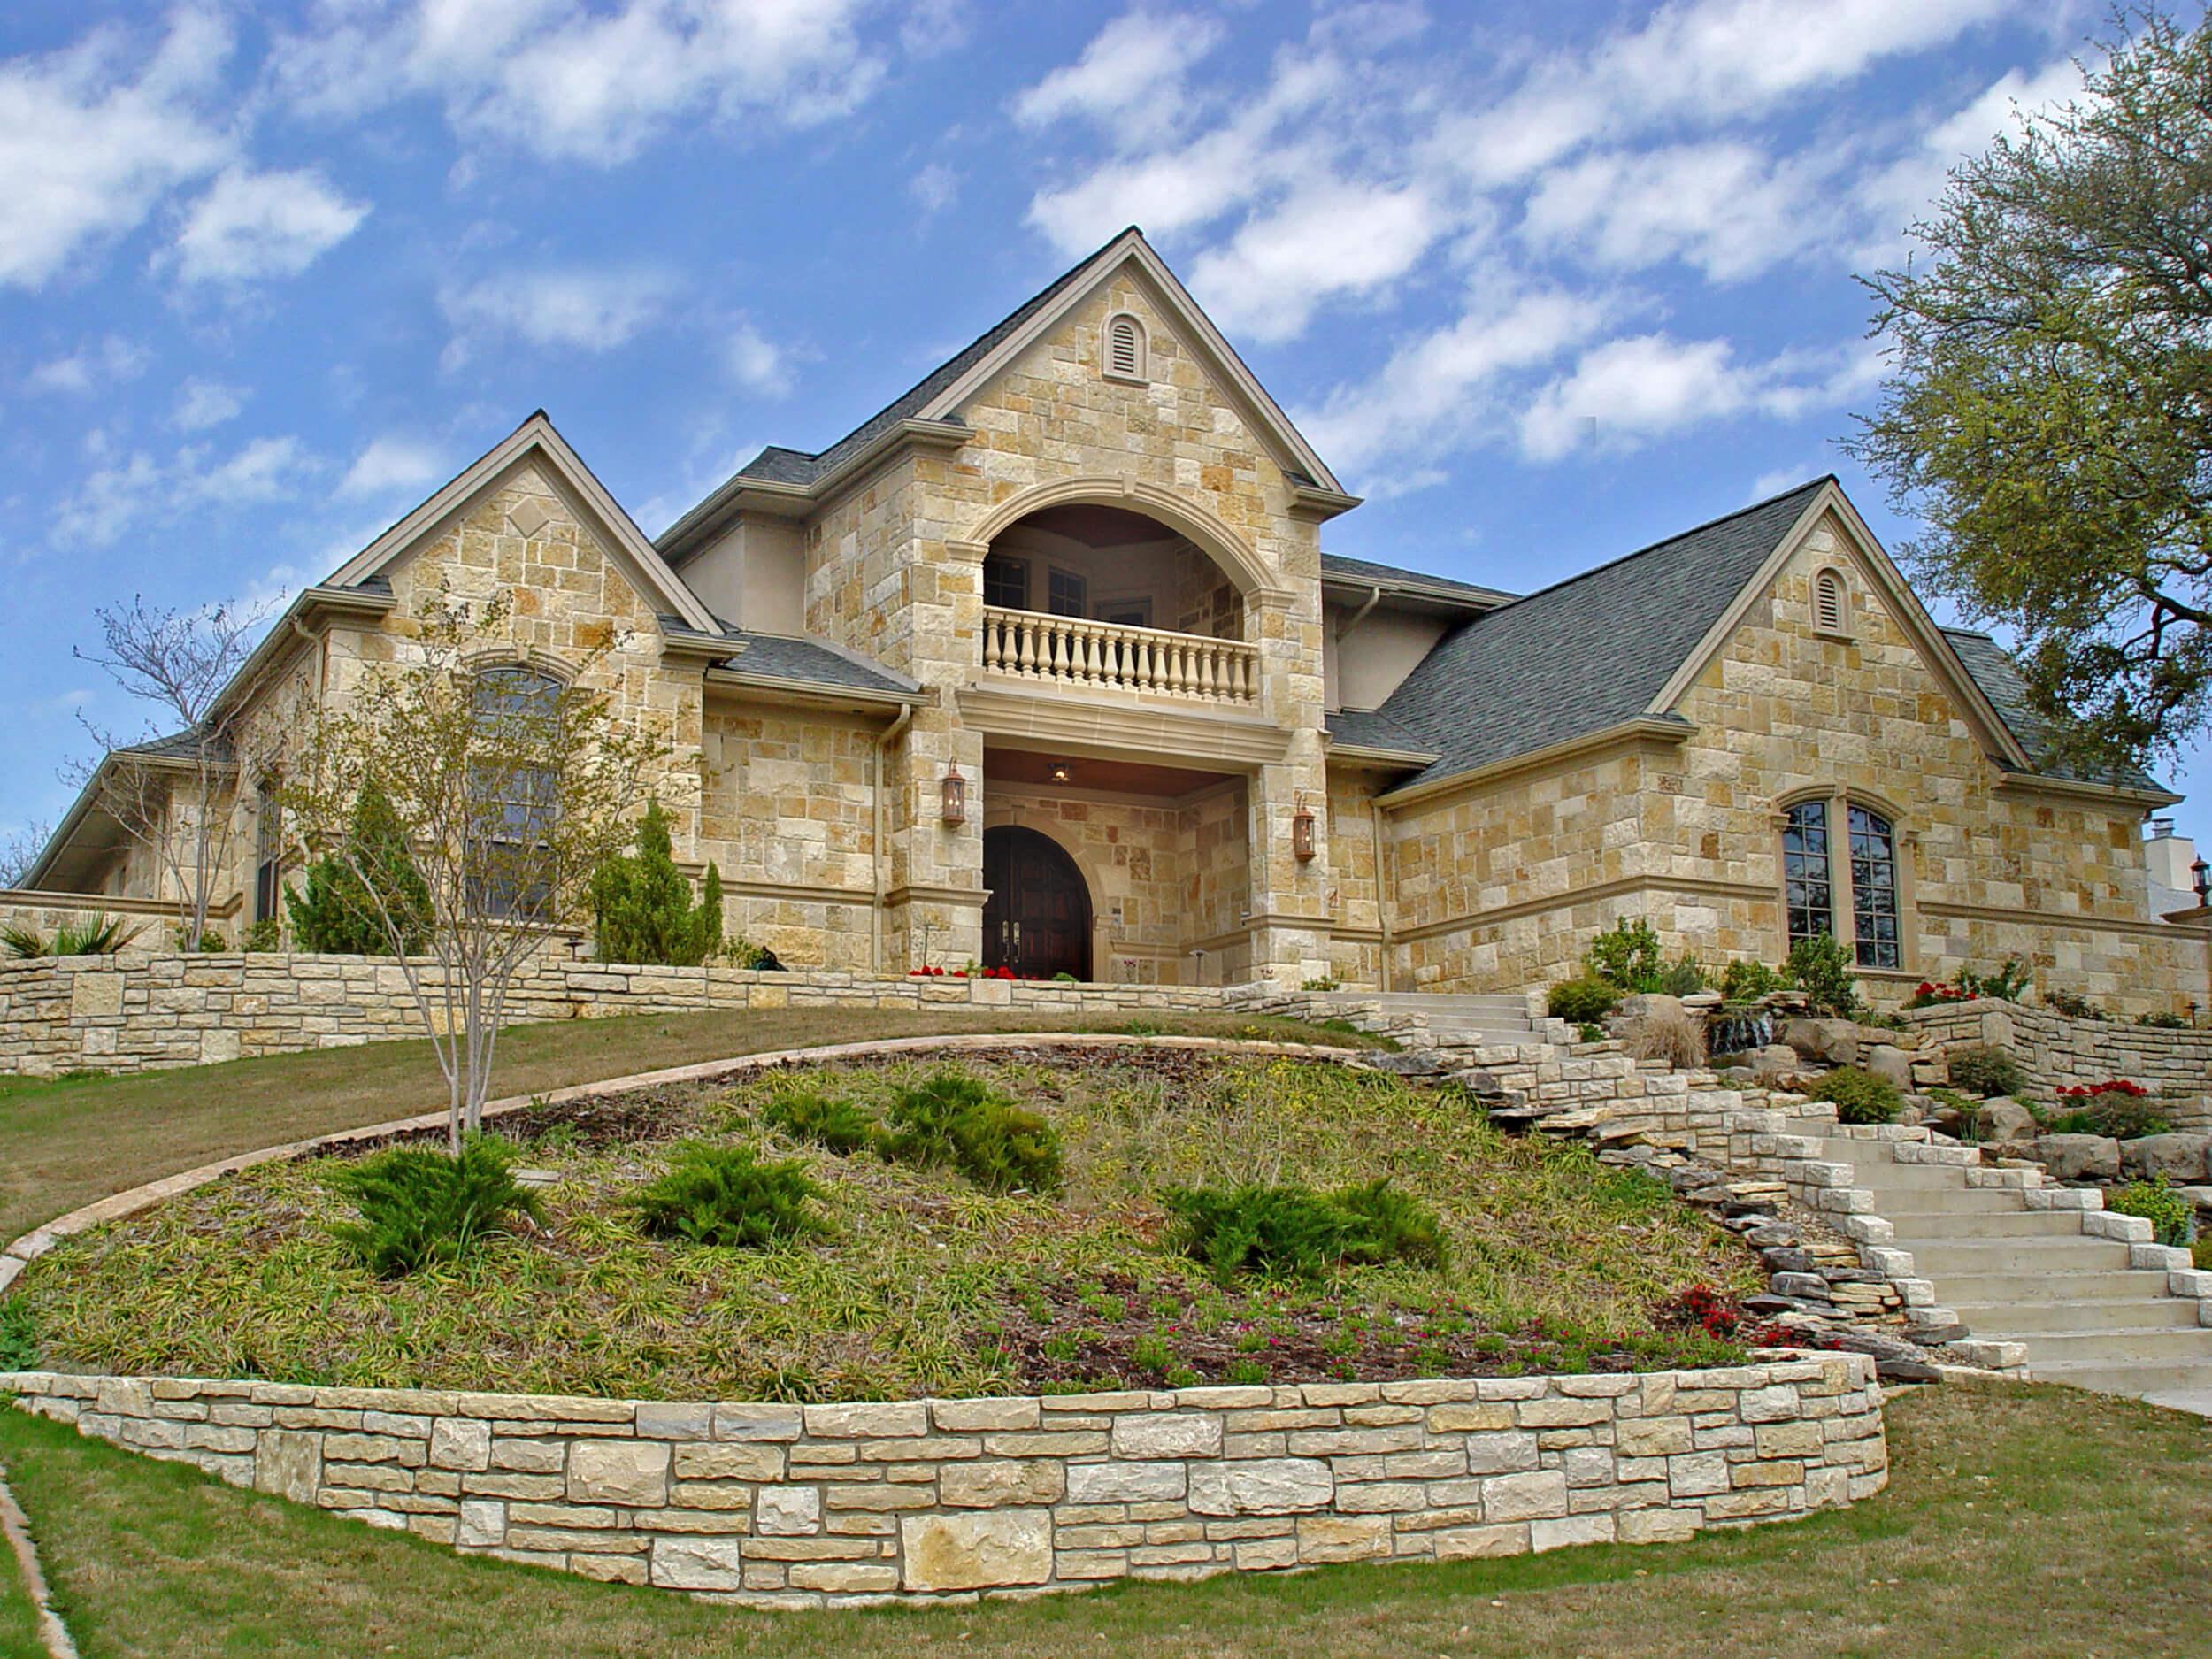 Steve Bumpas Custom Homes Bentwater 01 Homebuilder Remodel Granbury Brazos Bend Cresson DeCordova Pecan Plantation Tolar Glen Rose Fort Worth.jpg